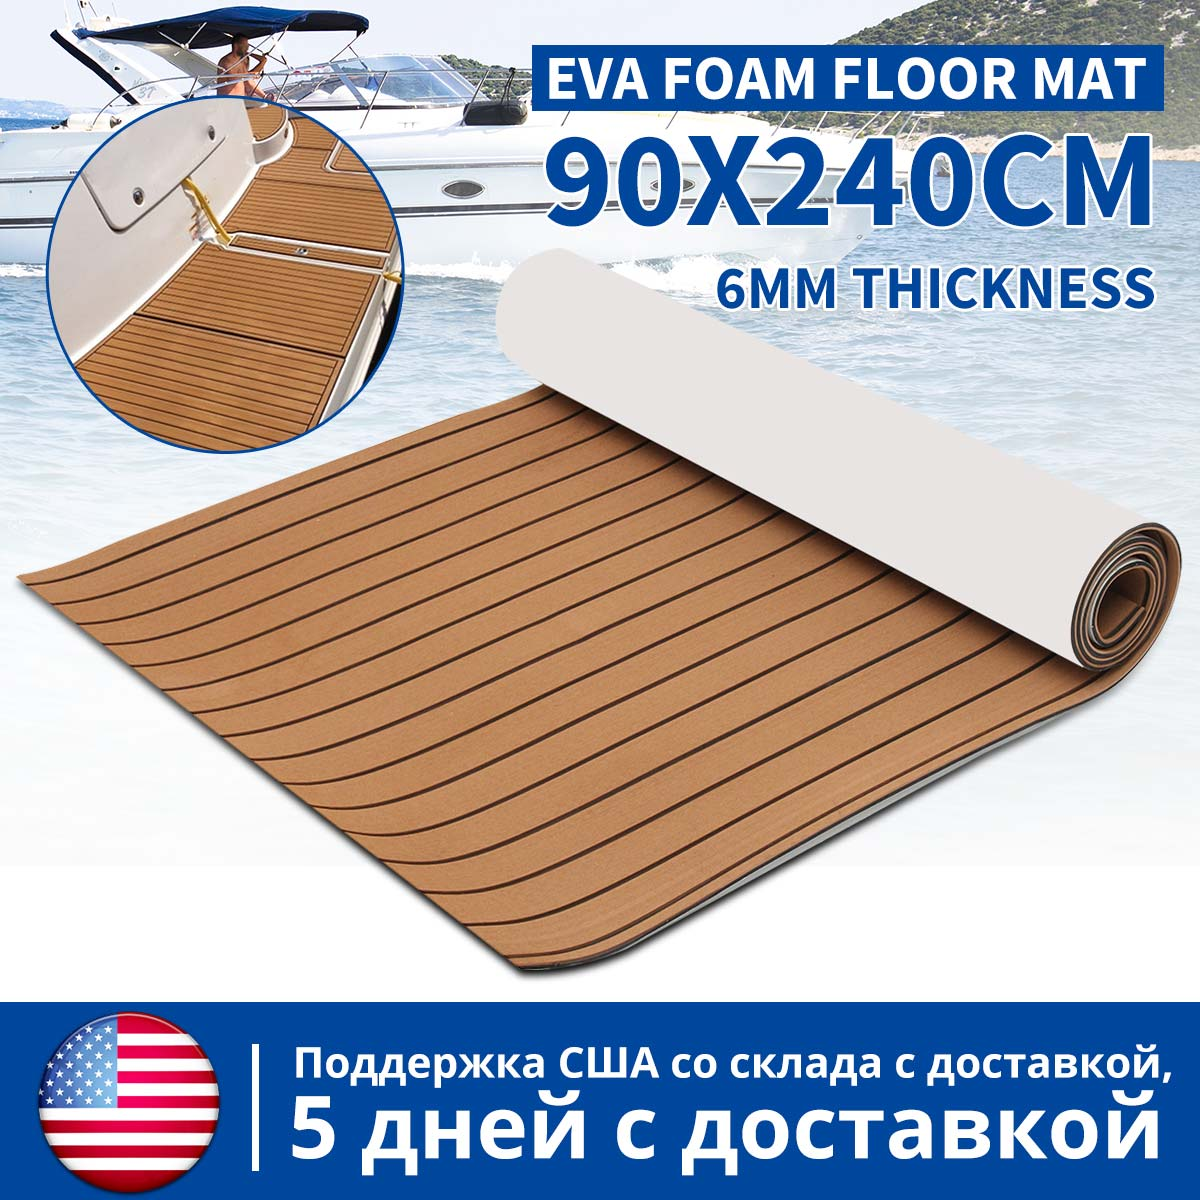 240cmX90cmX6mm Self Adhesive EVA Boat Yacht Marine Teak Flooring Faux Teak Decking Sheet Pad Foam Floor Mat Brown